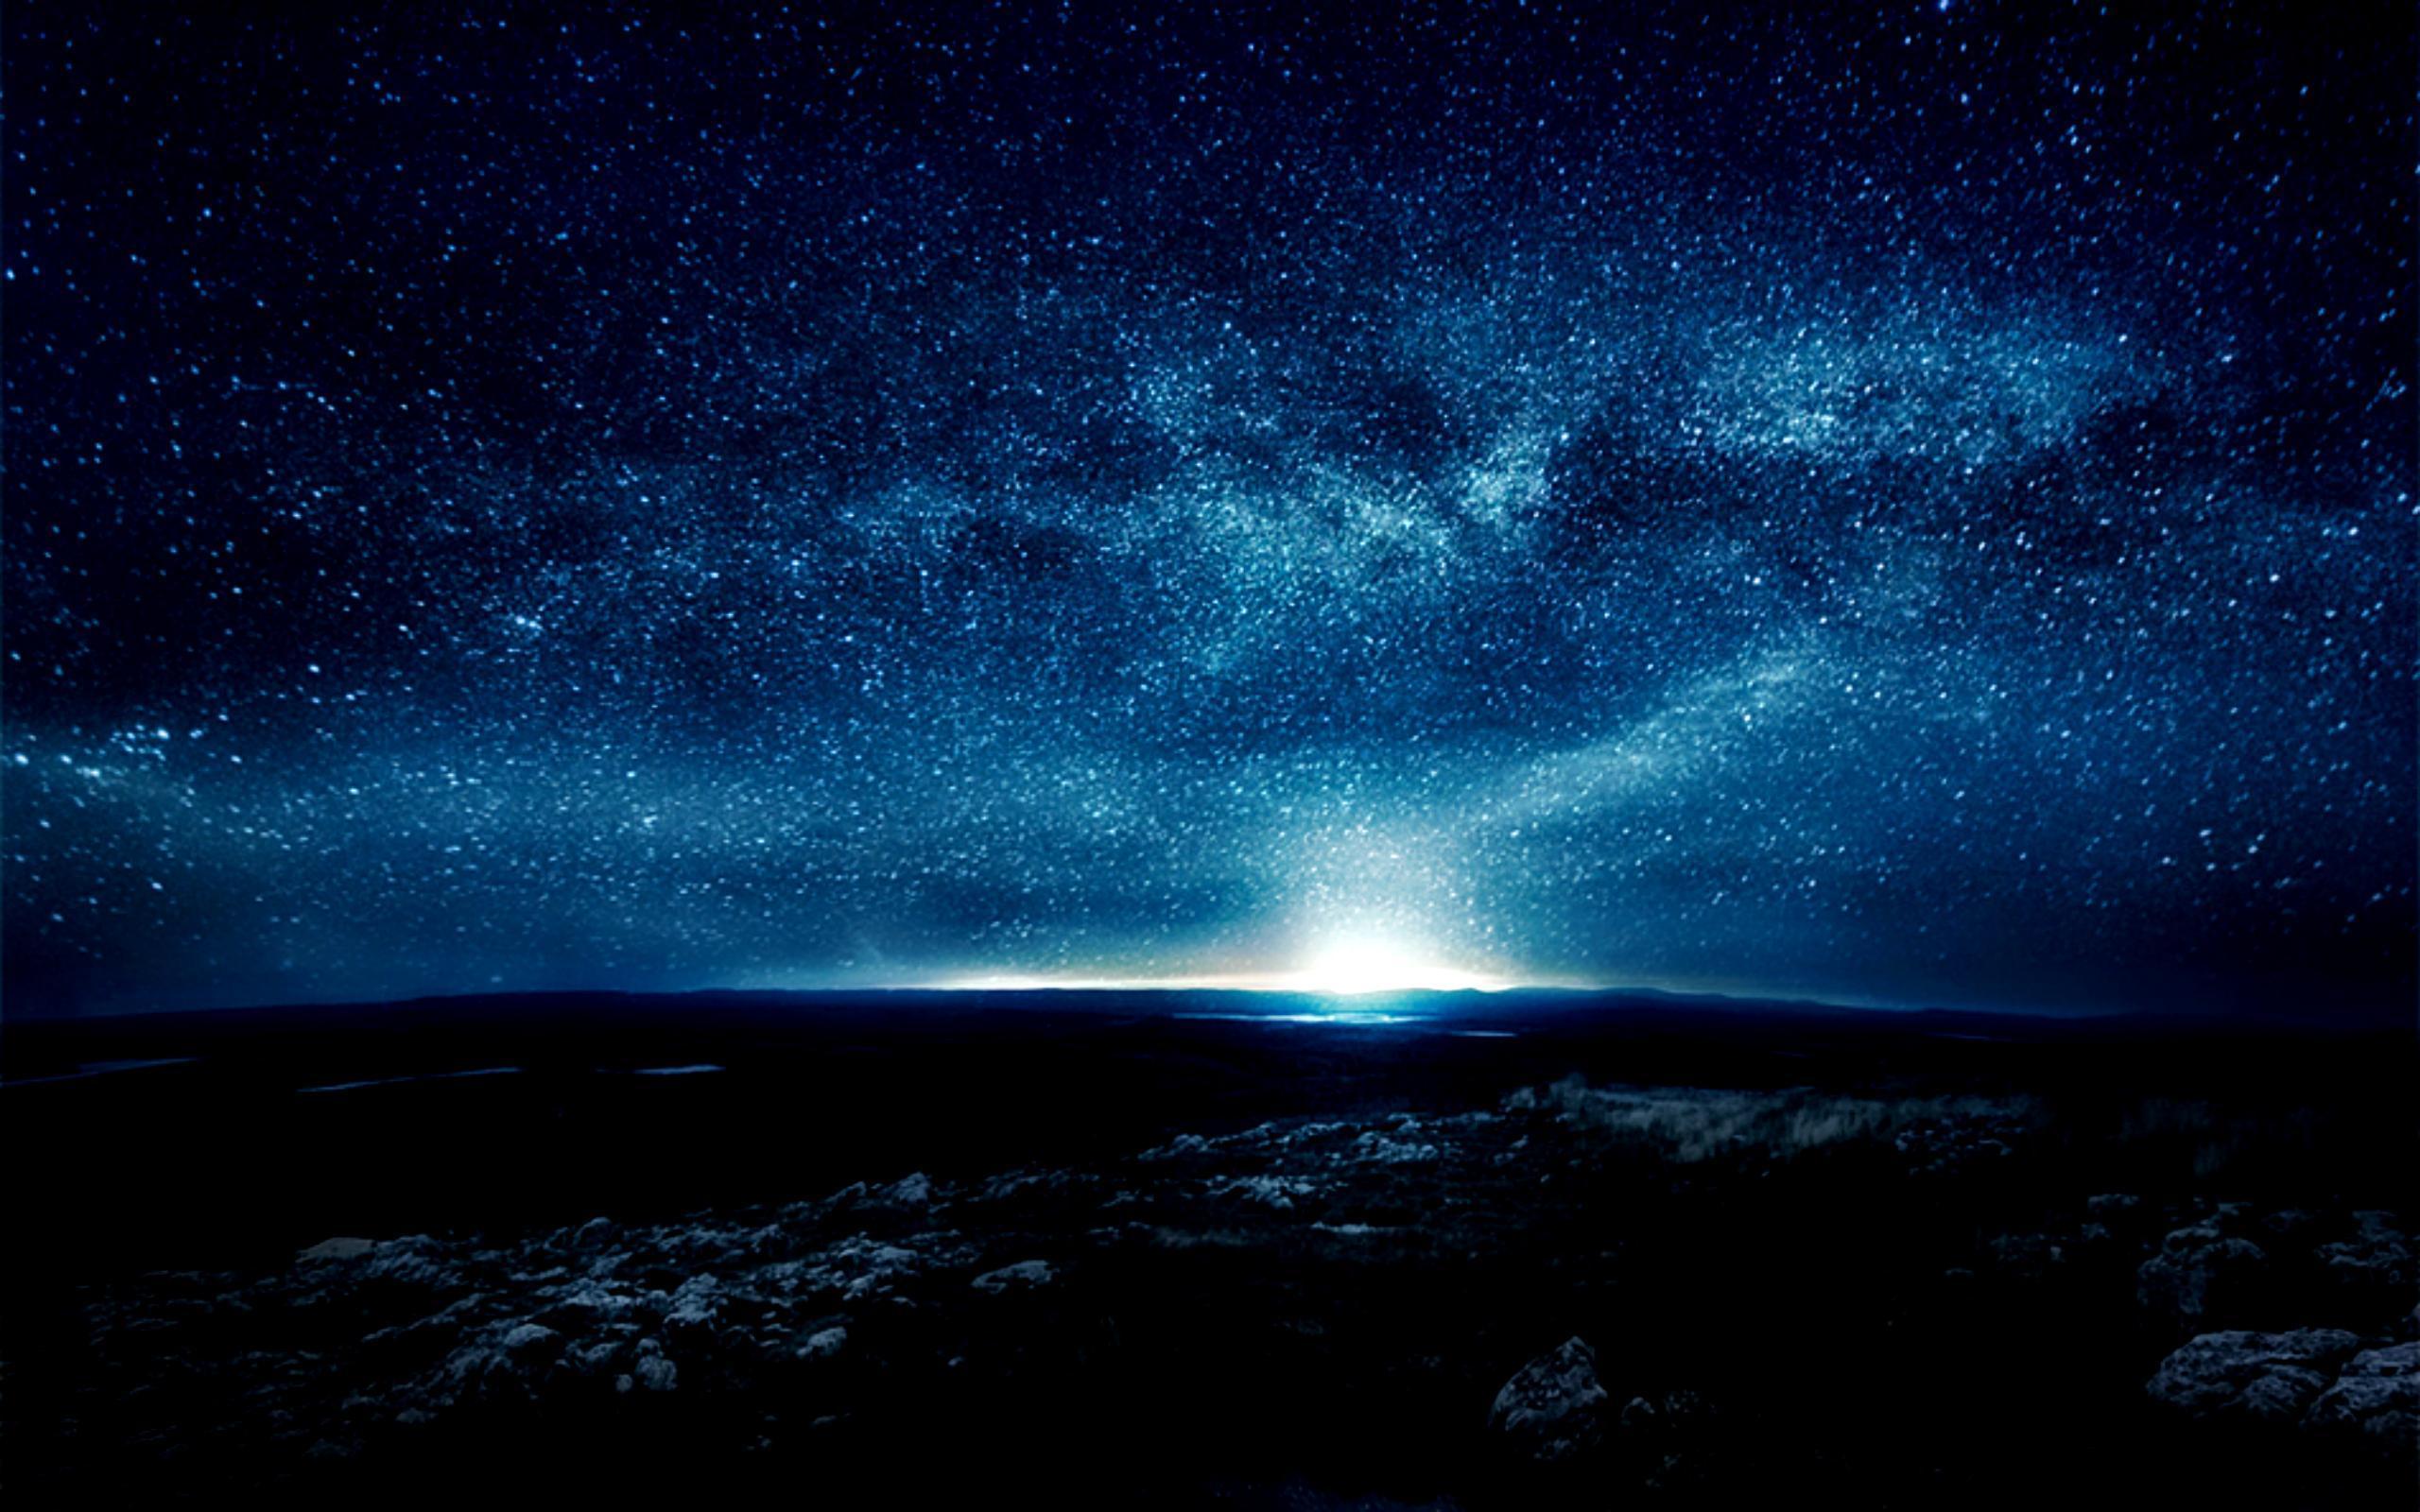 Starry Night Sky Wallpapers 2560x1600